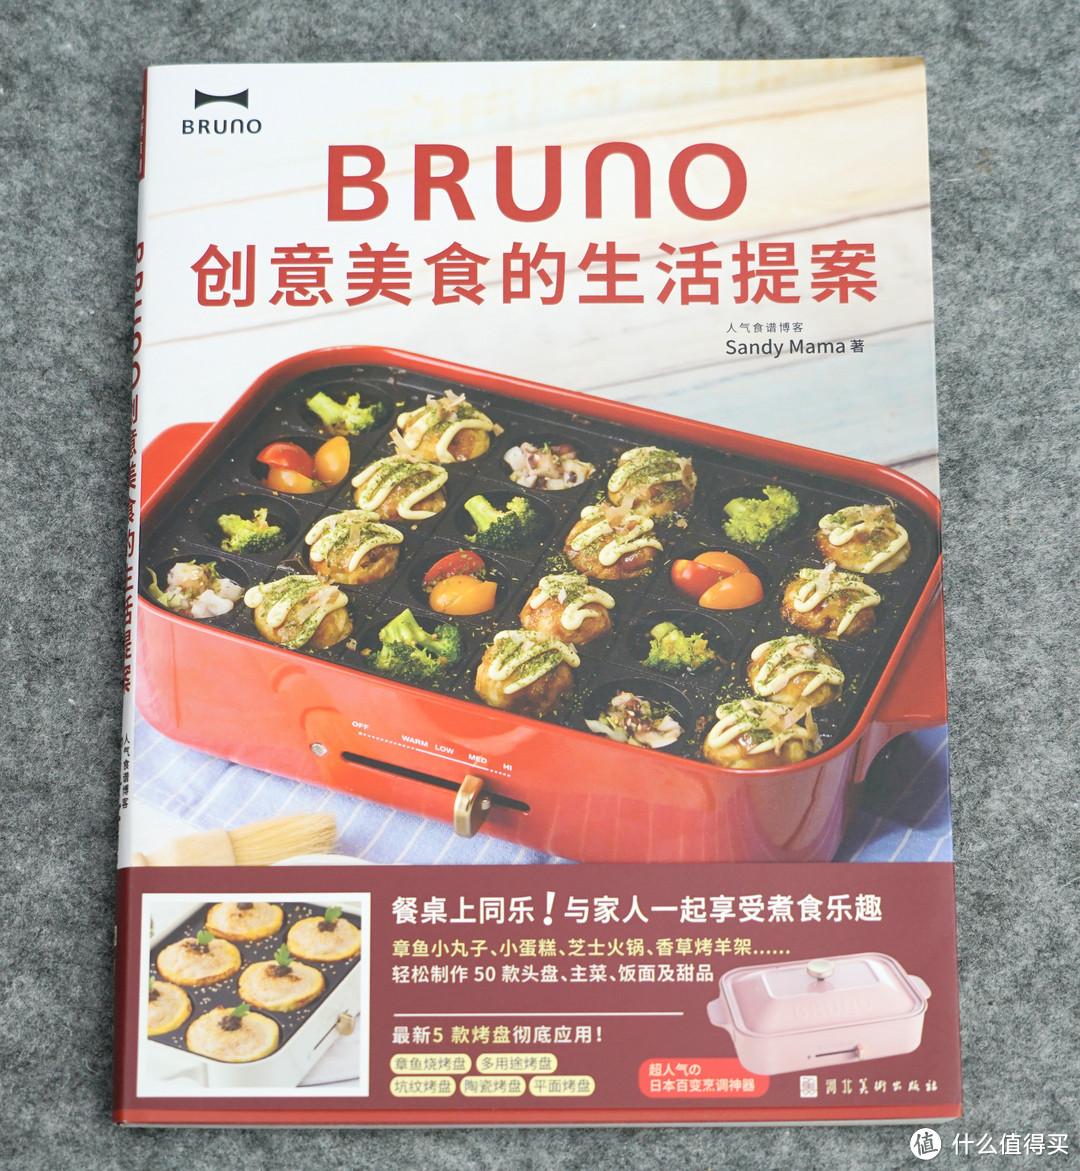 Bruno VS 摩飞,多功能料理锅全方位终极评测